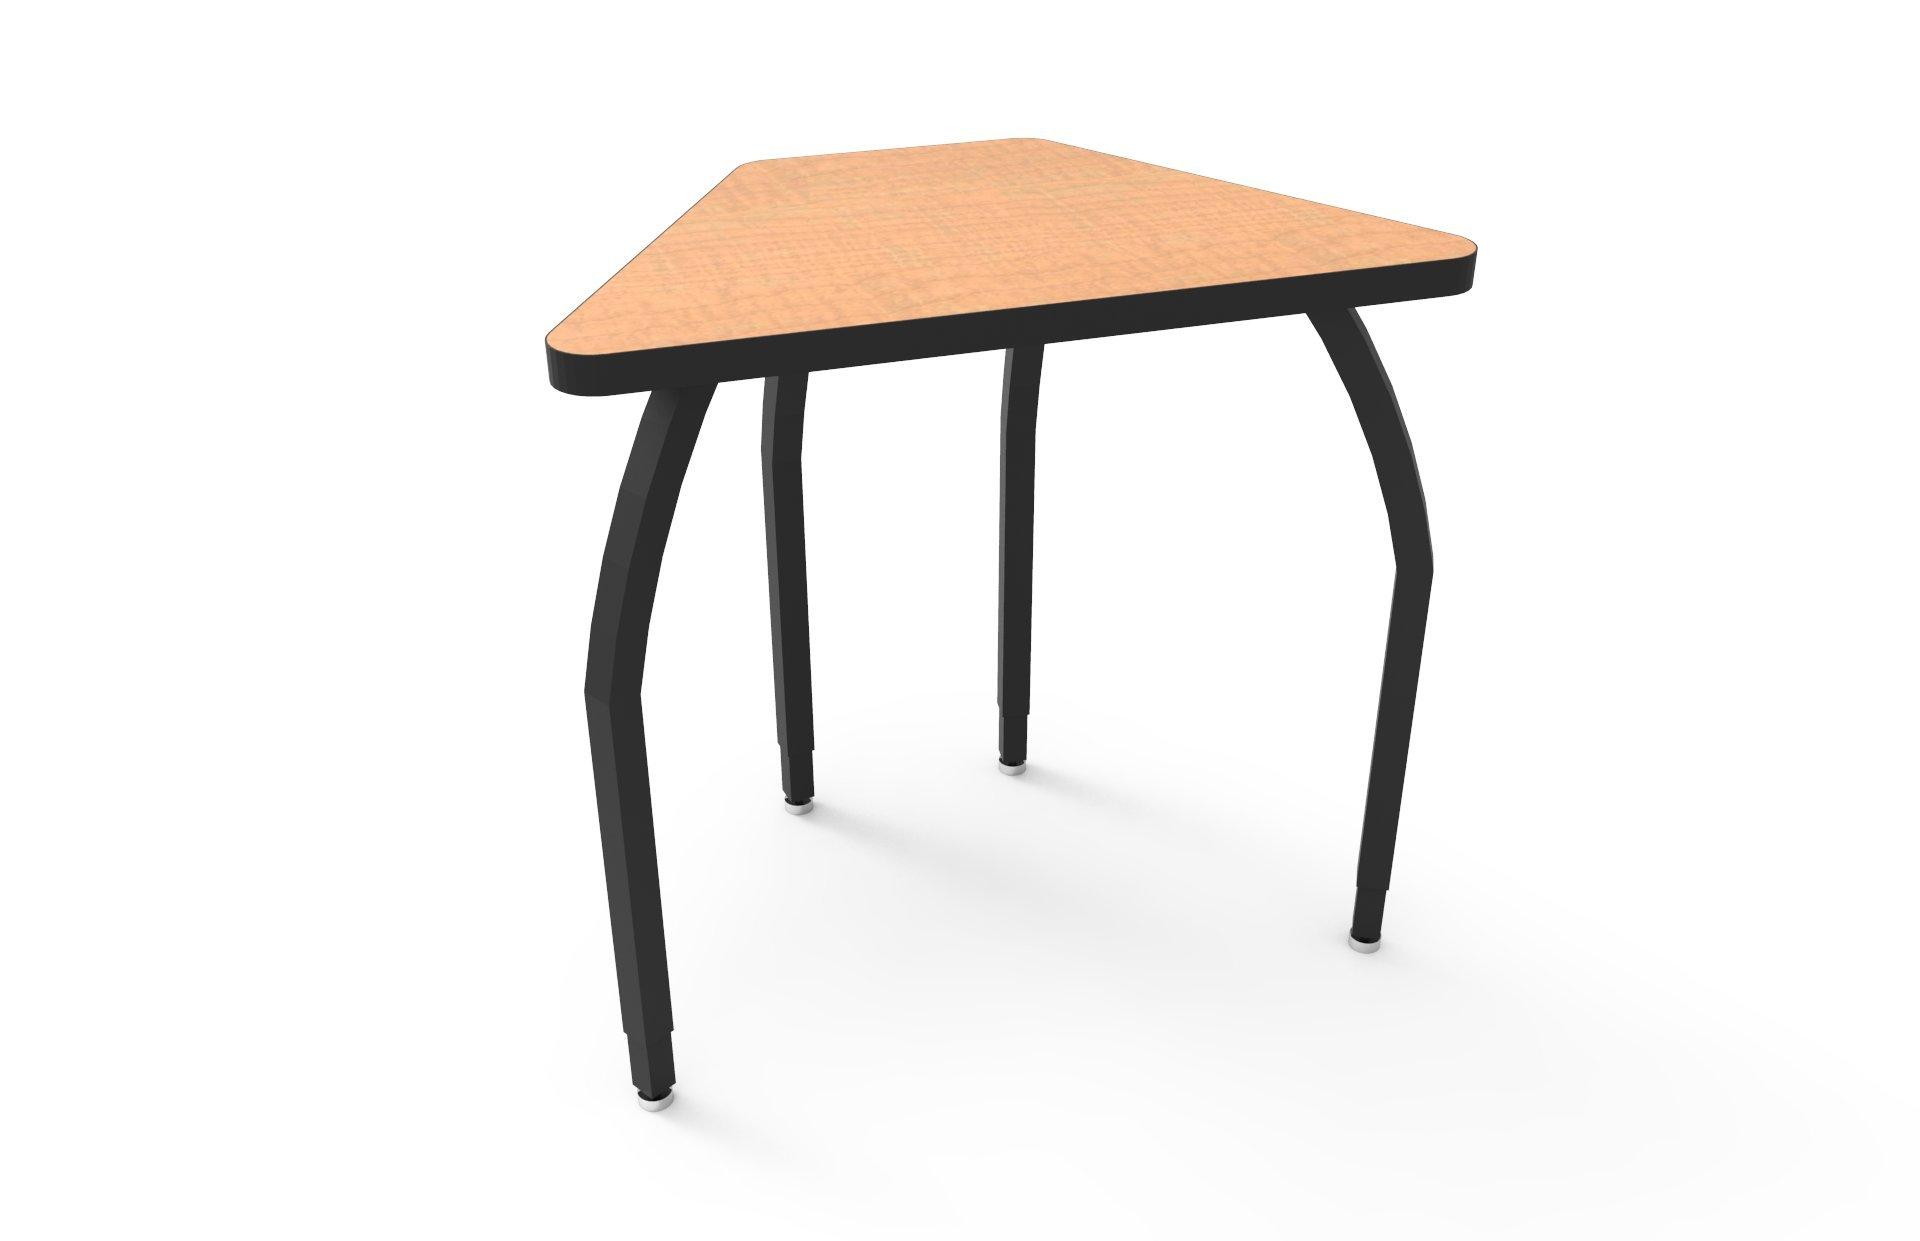 ELO Connect 6 desk w/ Fusion Maple laminate, 4 adjustable black legs